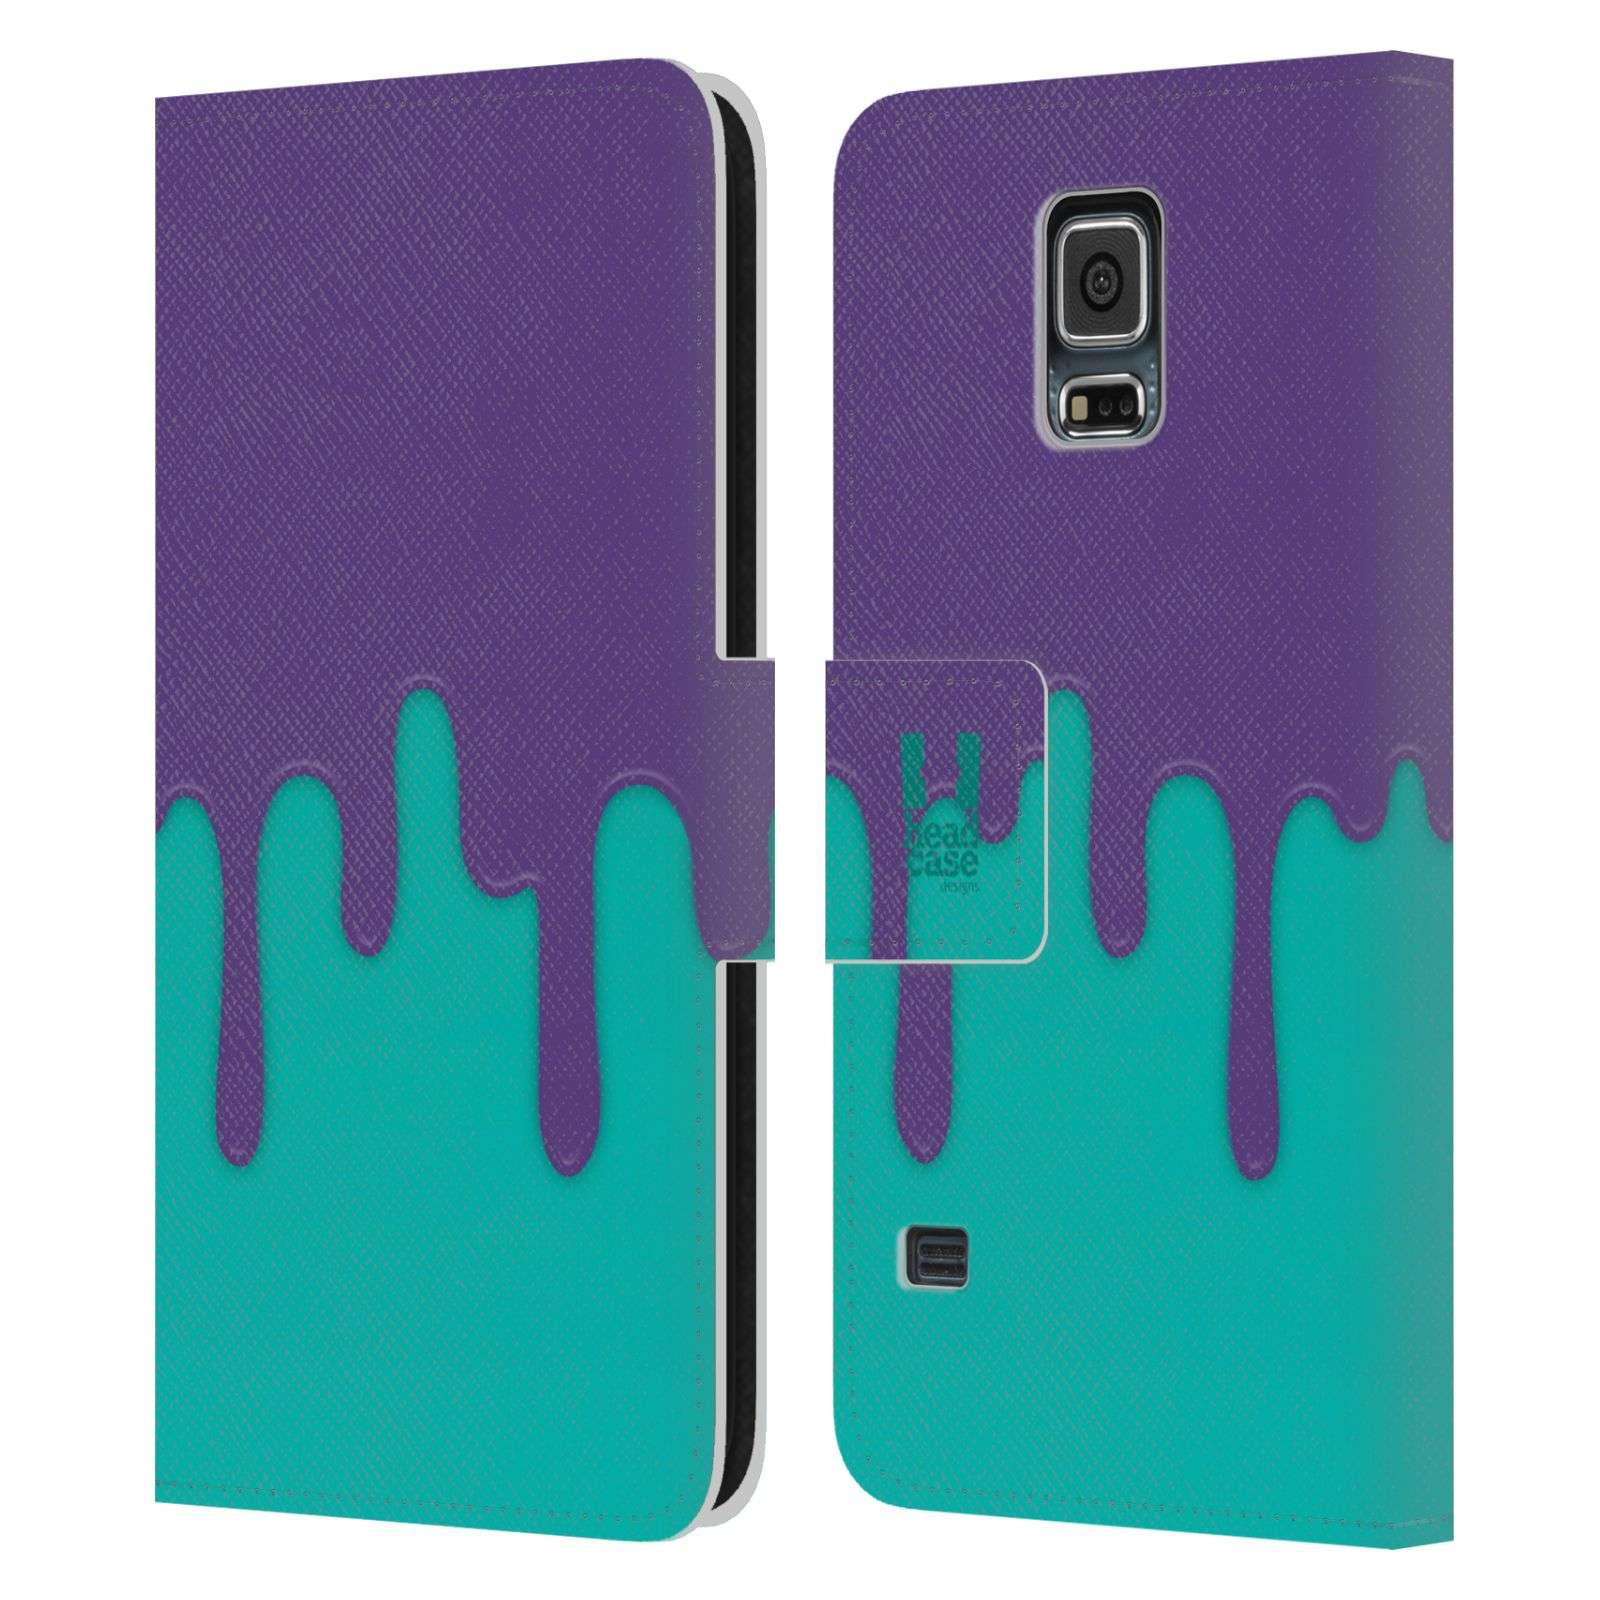 HEAD CASE Flipové pouzdro pro mobil Samsung Galaxy S5 / S5 NEO Rozlitá barva fialová a tyrkysová